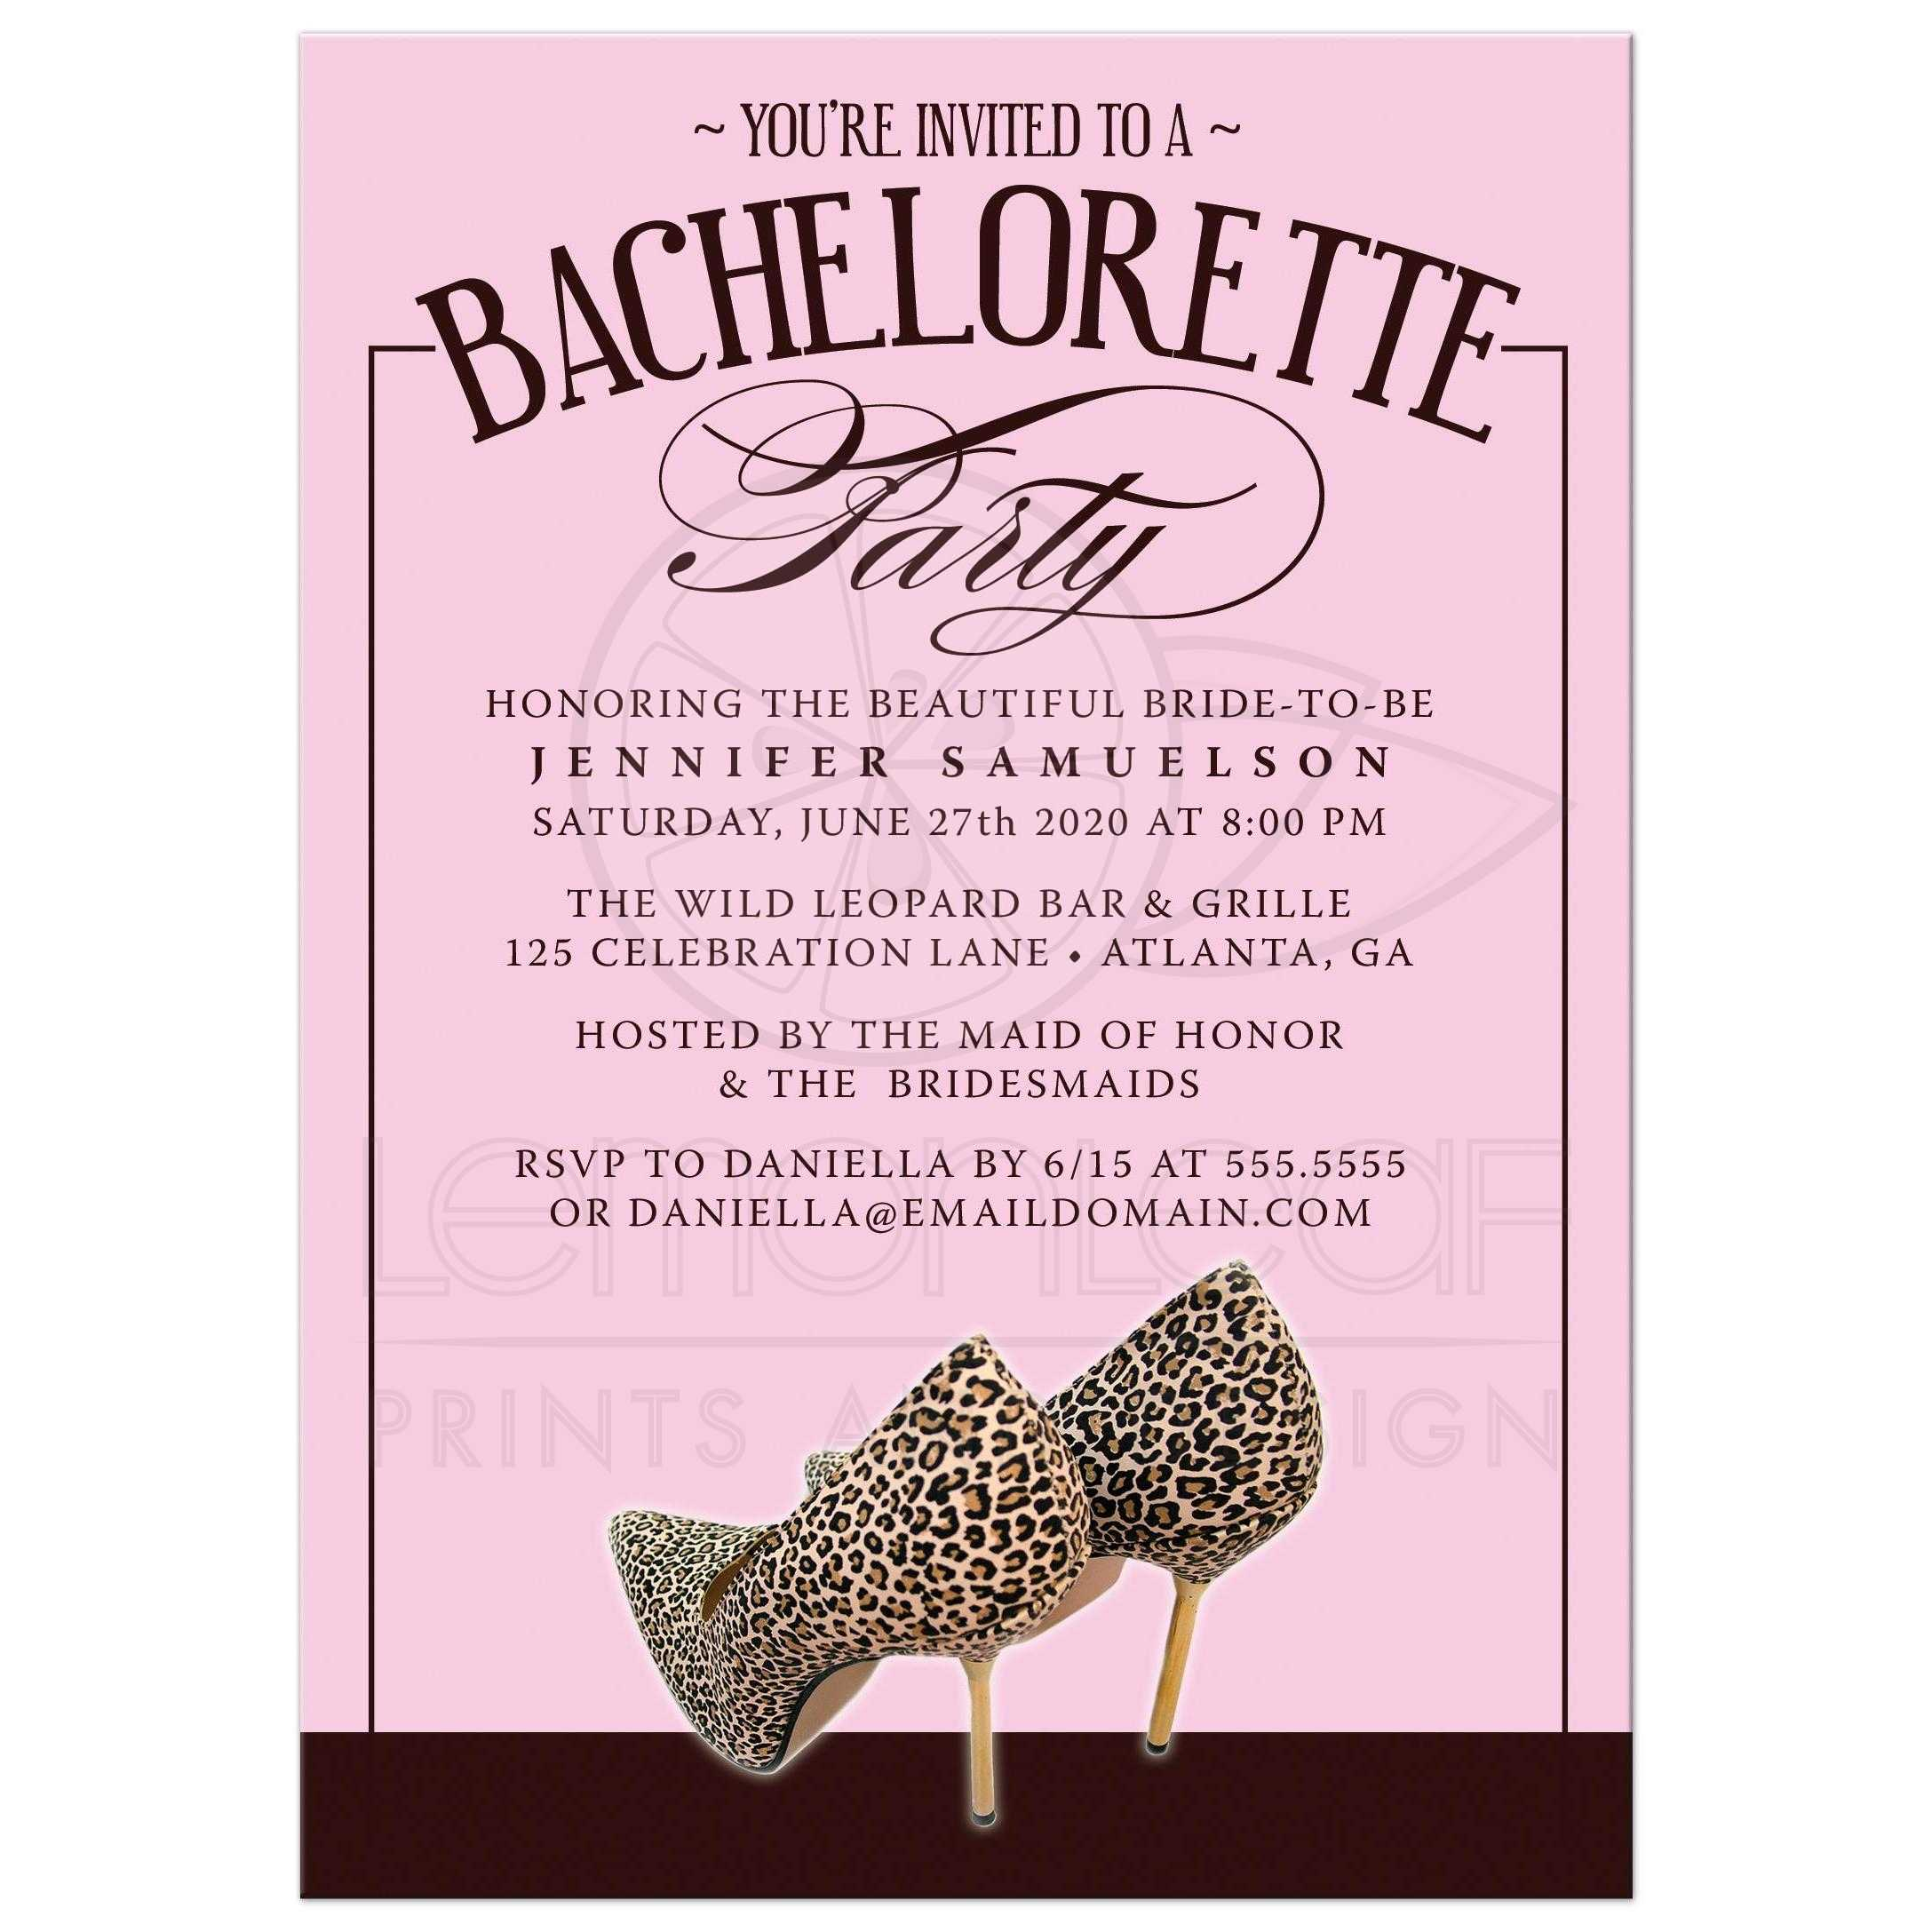 bachelorette party invitations leopard print shoes pink